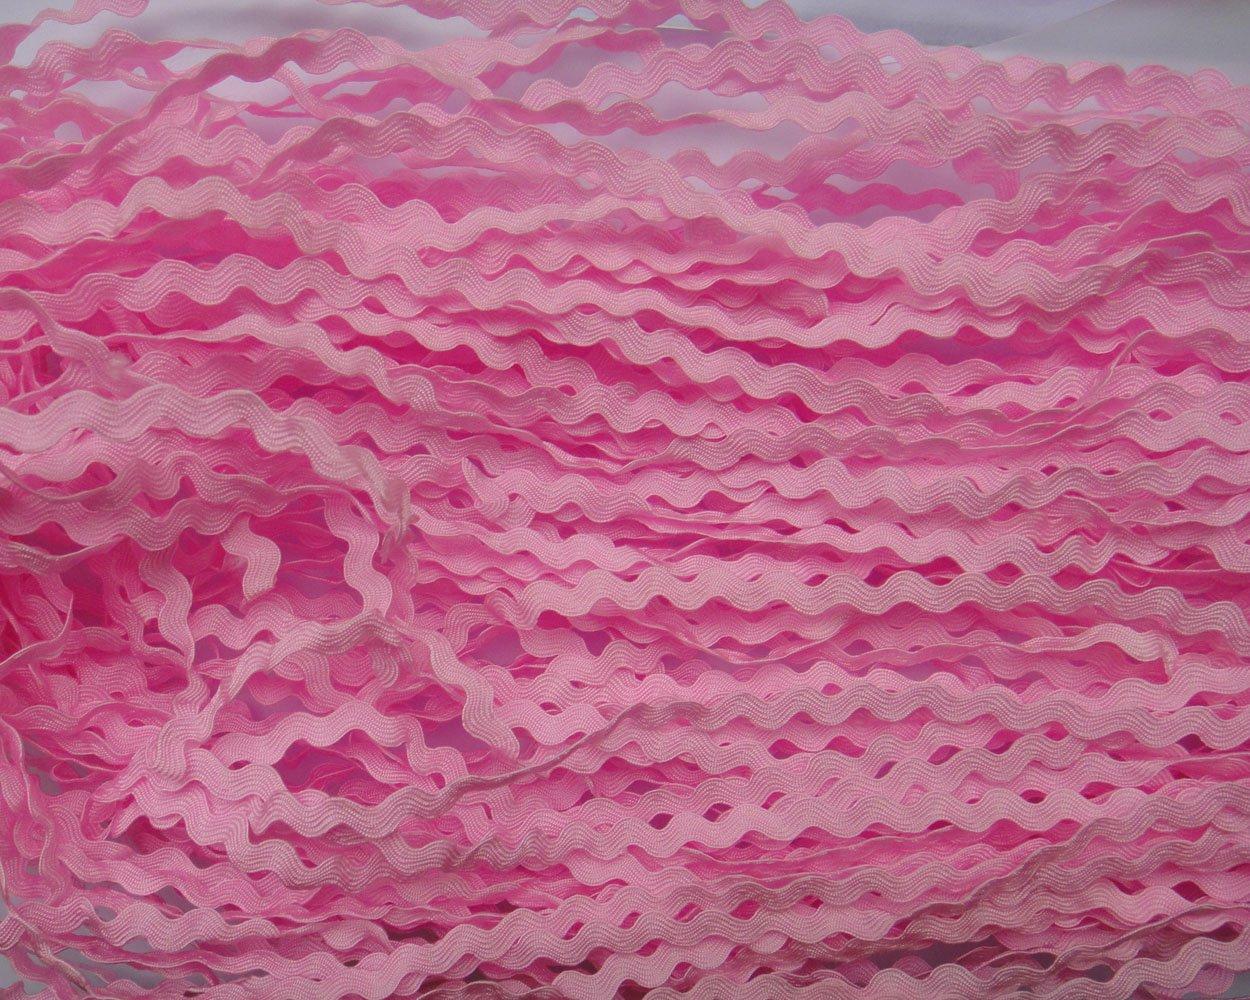 Lyracces Wholesale Lots 40yards Mini 5mm 24color Pick Woven Rick Rack Ribbon Ric Rac Trims Scrapbooking Dressmaking (White #11) GarmentSewingsupplies